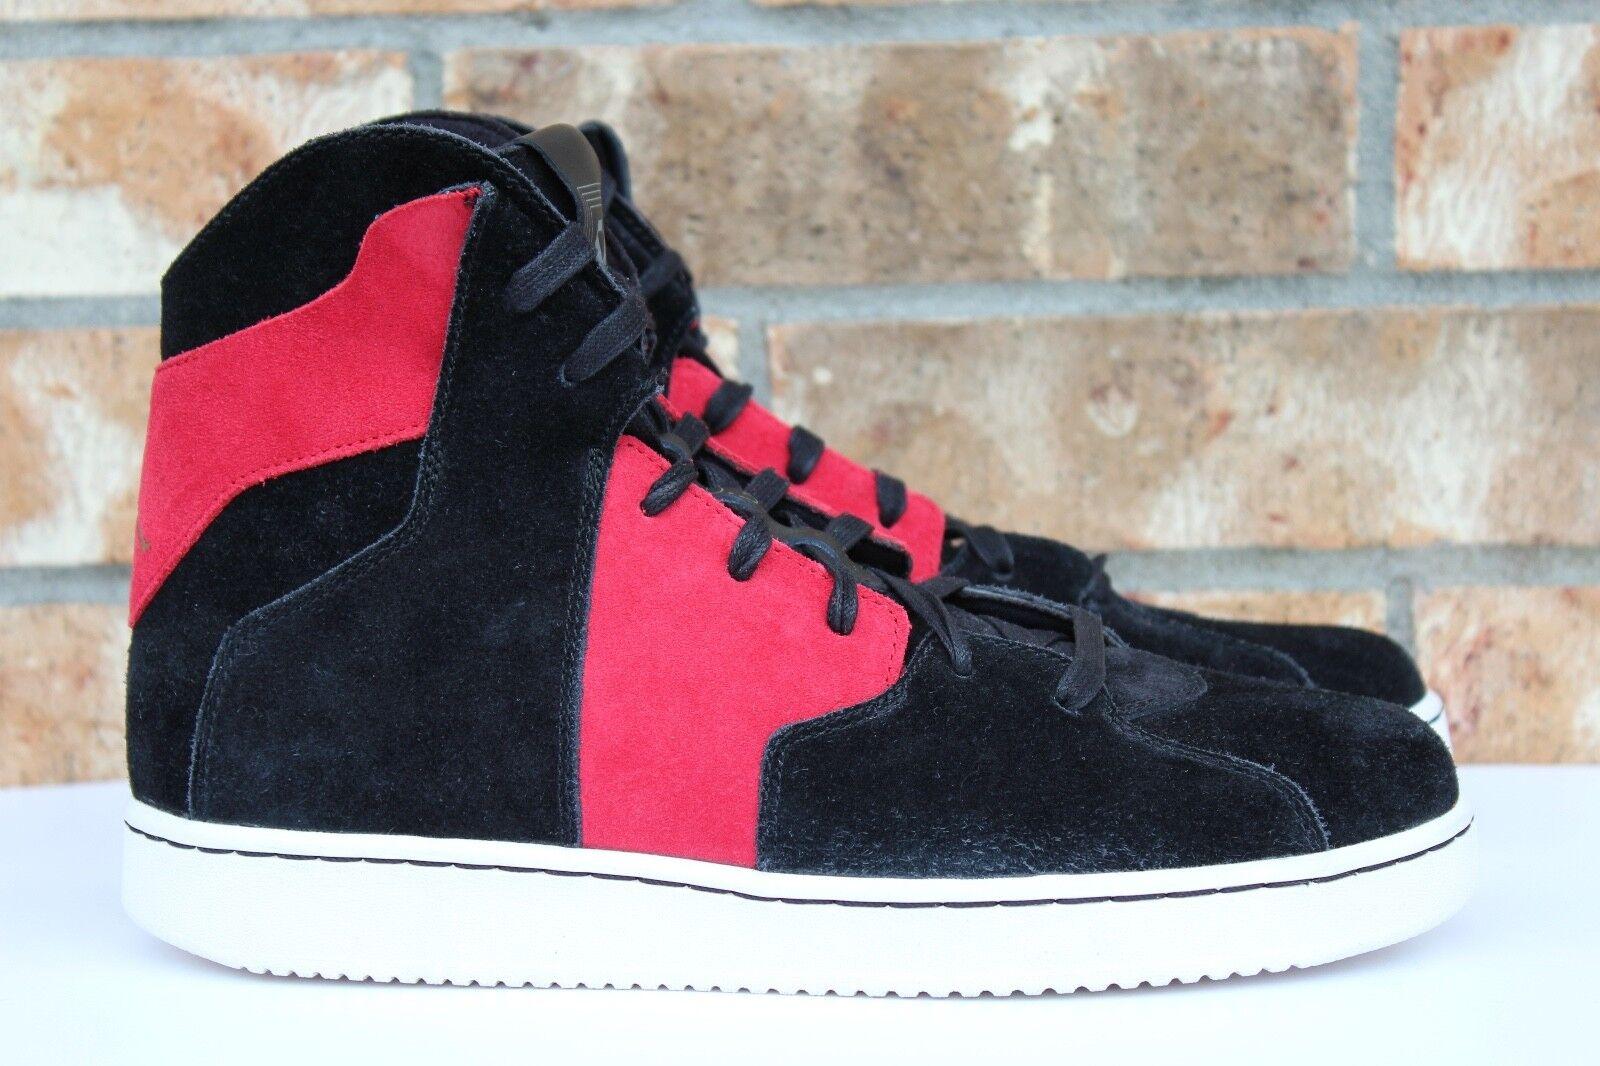 Men's Nike Air Jordan Westbrook 0.2 Why Not Black Red Sail Sz 8-11.5 854563-001